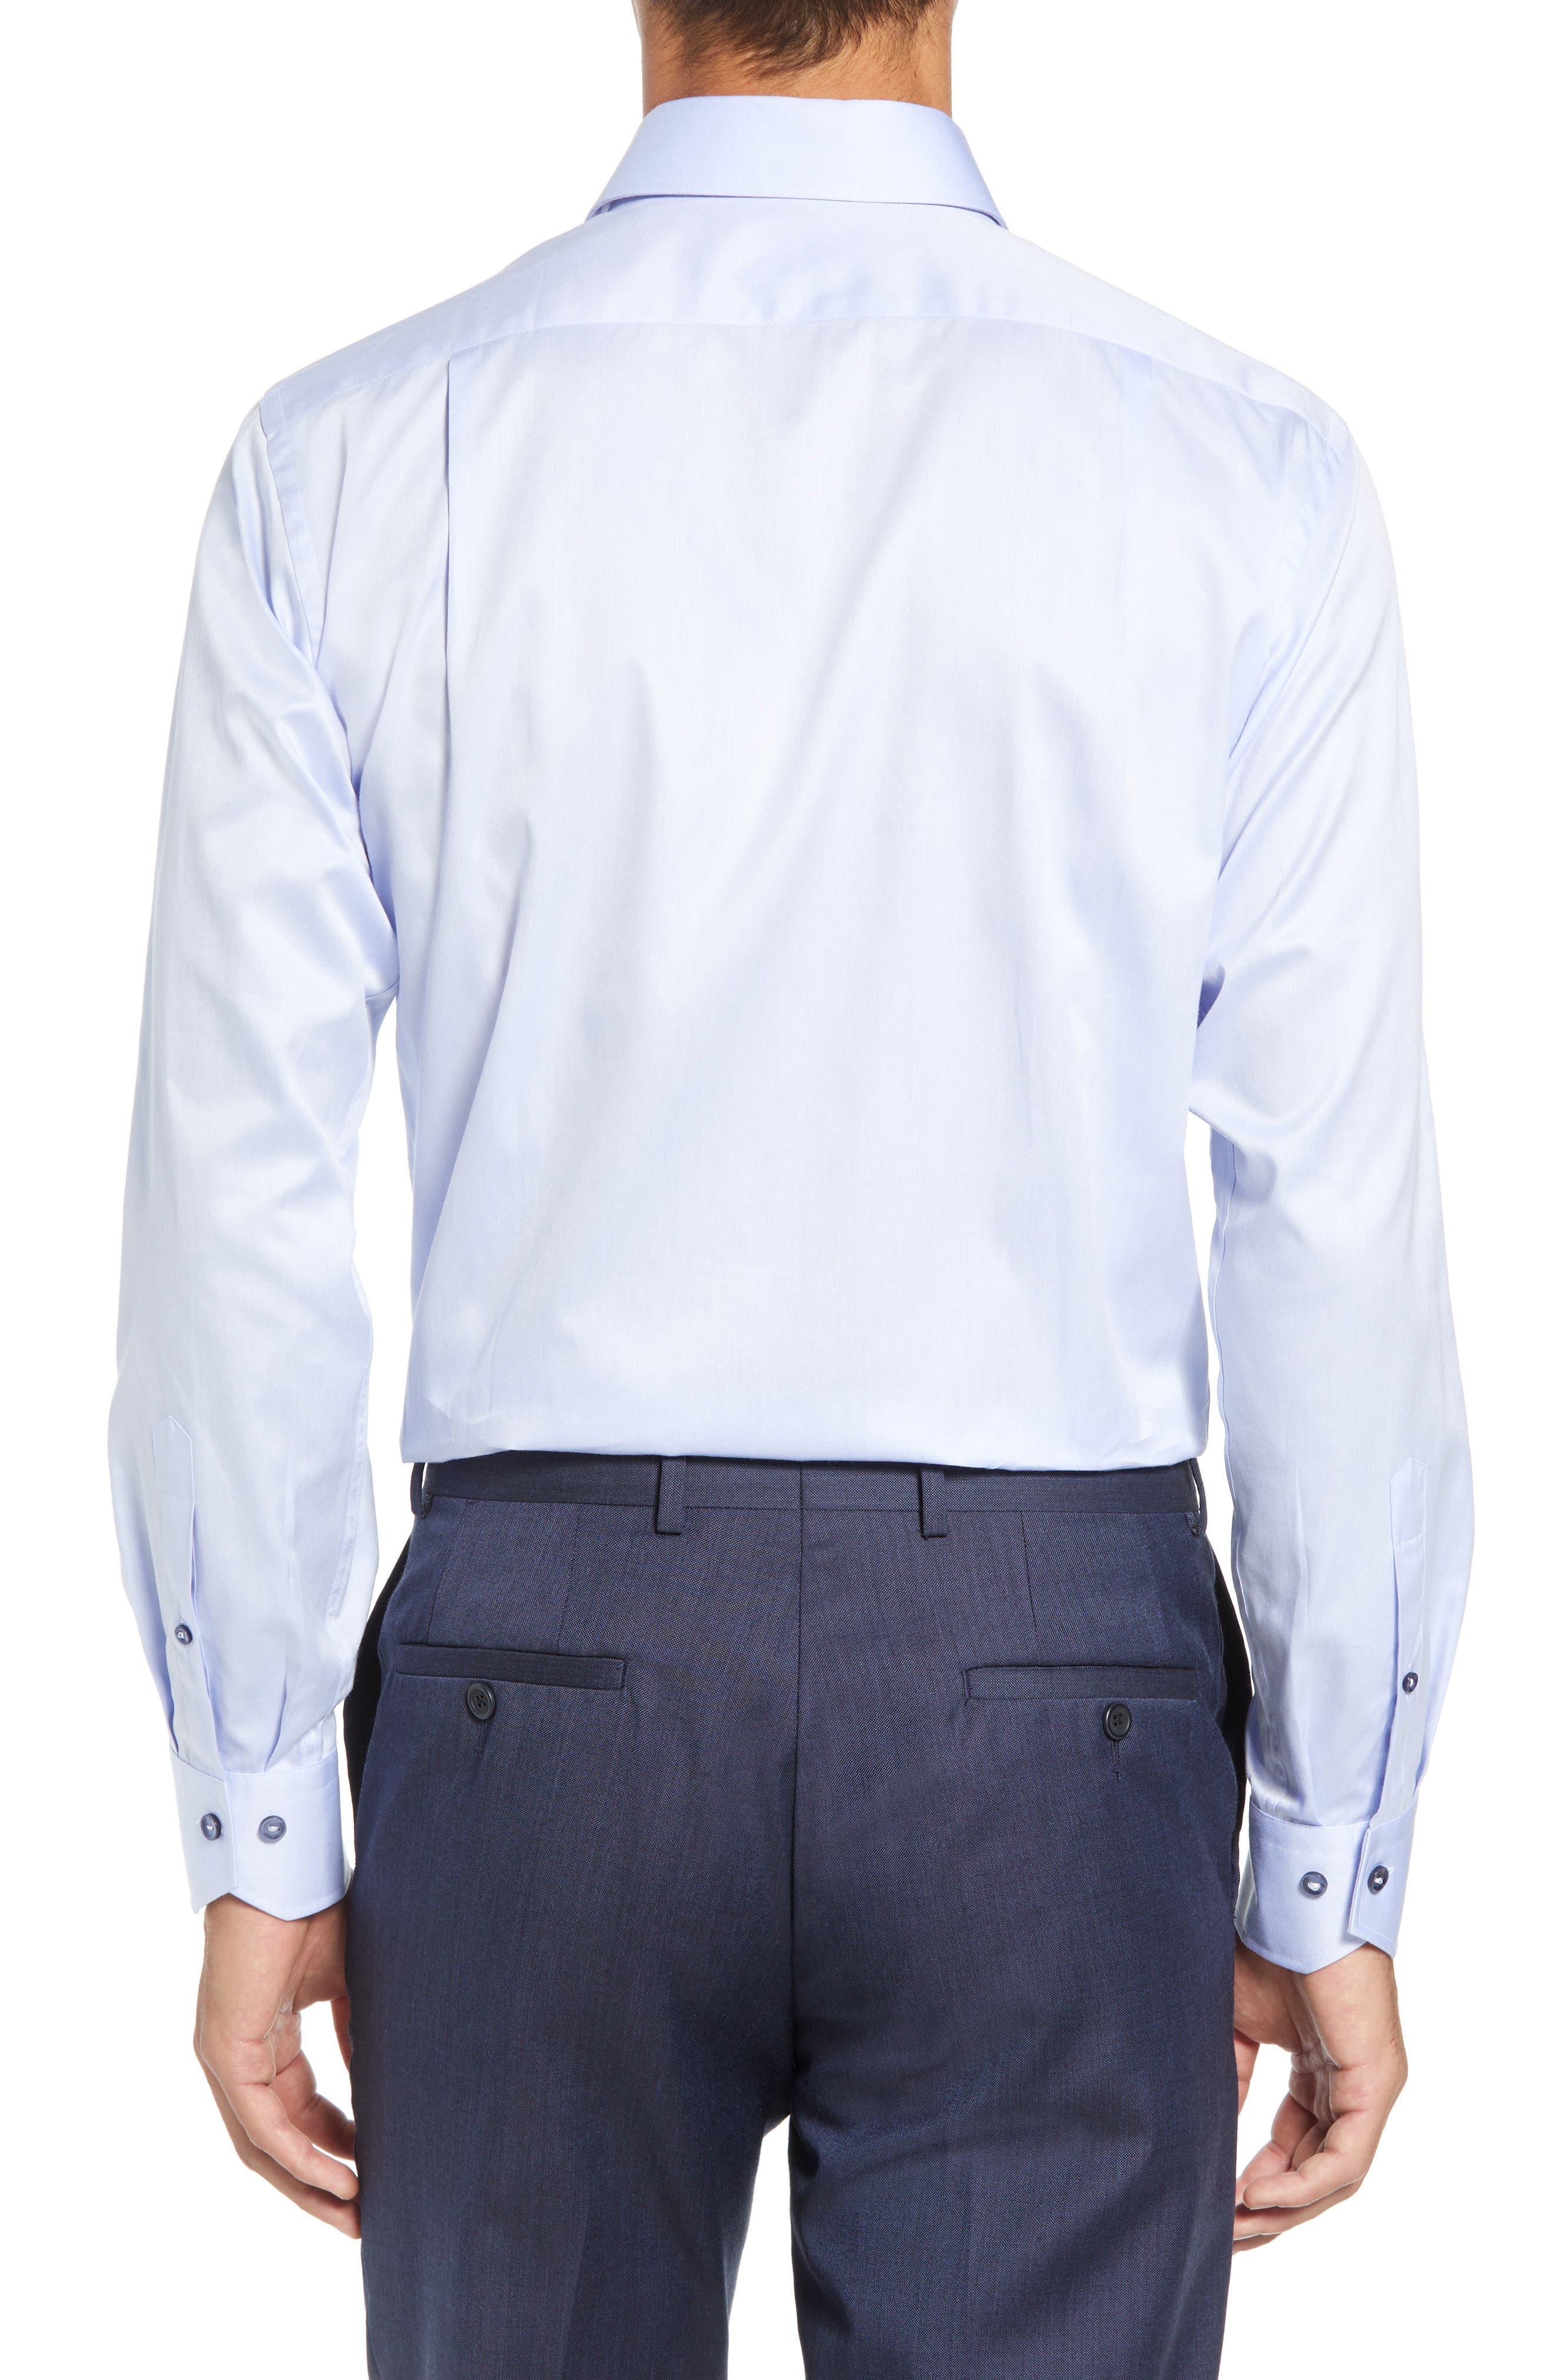 LORENZO UOMO,                             Trim Fit Solid Dress Shirt,                             Alternate thumbnail 3, color,                             LIGHT BLUE